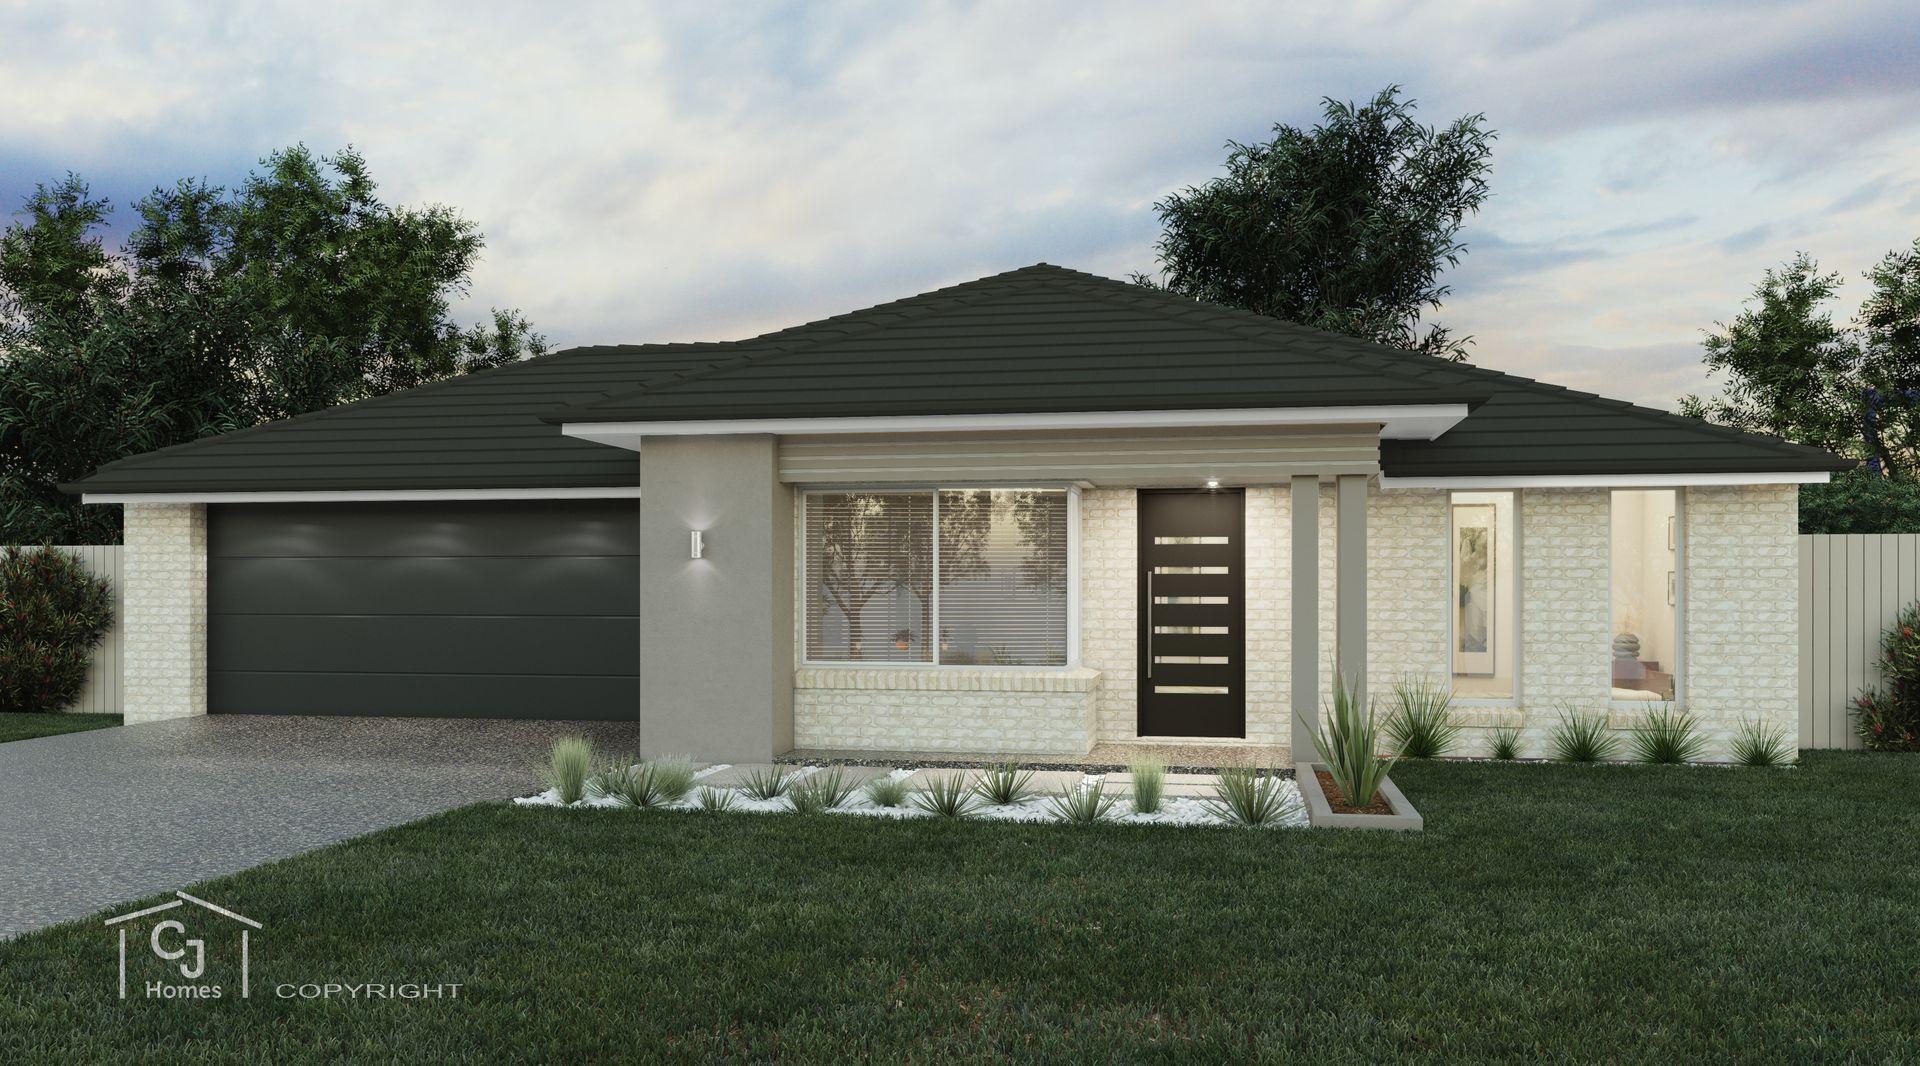 Lot 22 Bantry St, Parkhurst QLD 4702, Image 0